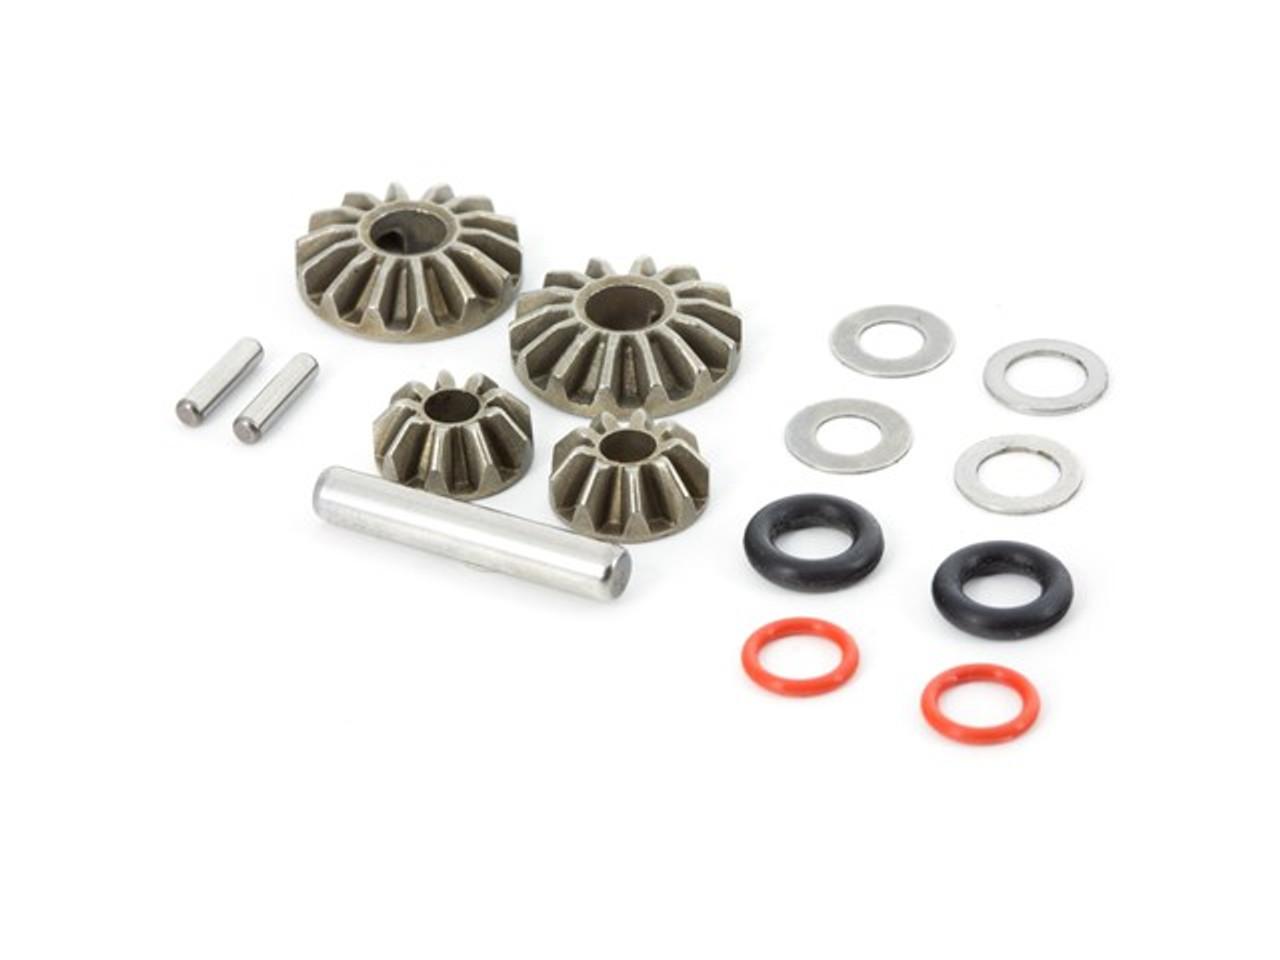 ARRMA 310378 Differential Gear Maintenance Set